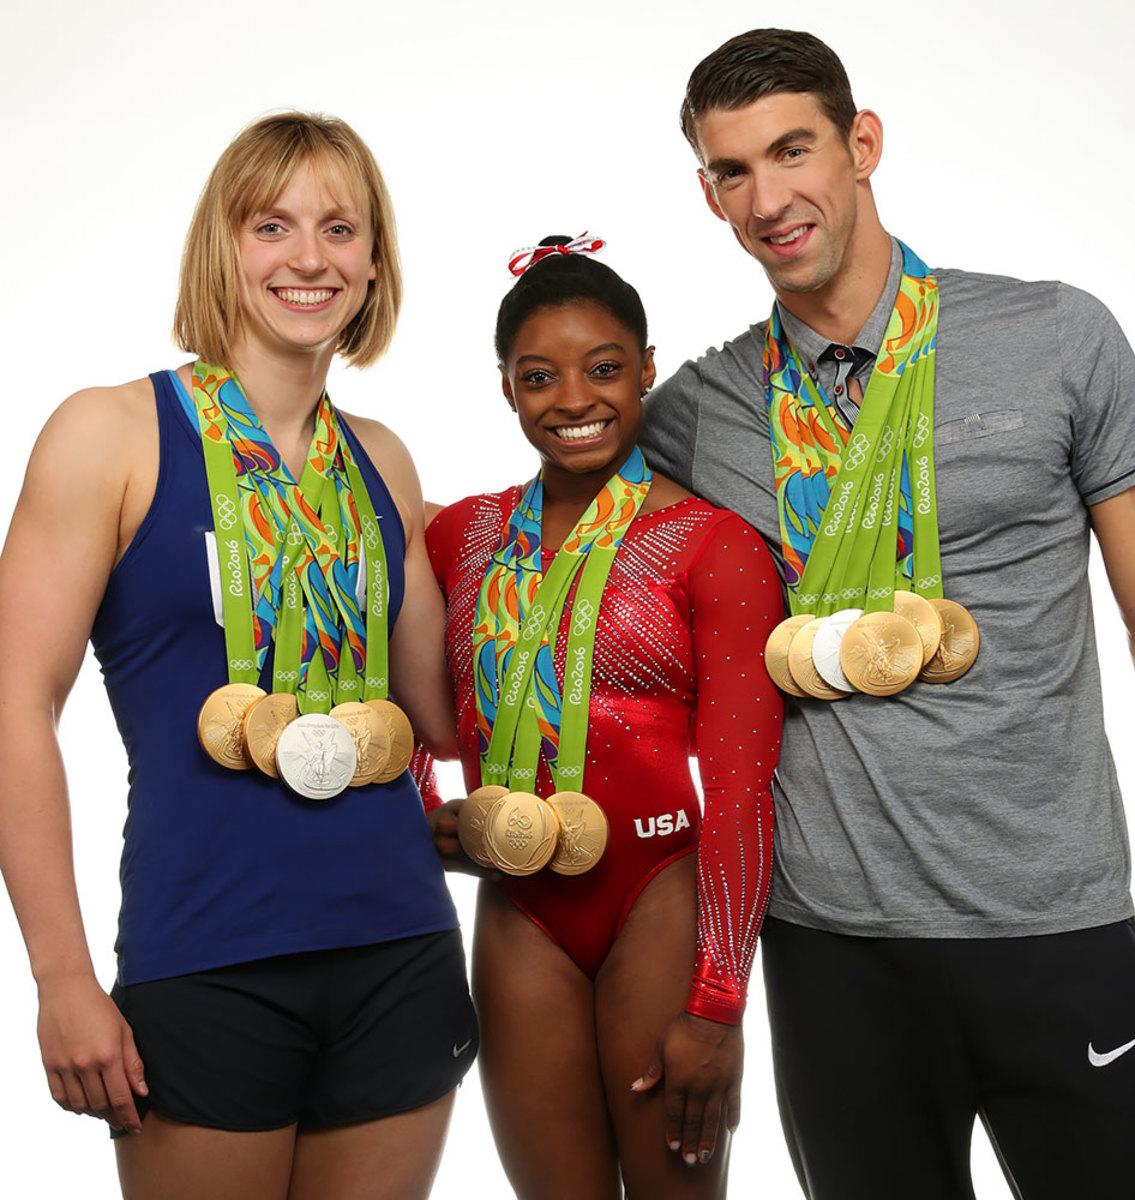 2016-0814-Katie-Ledecky-Simone-Biles-Michael-Phelps-SI51_TK3_00298.jpg